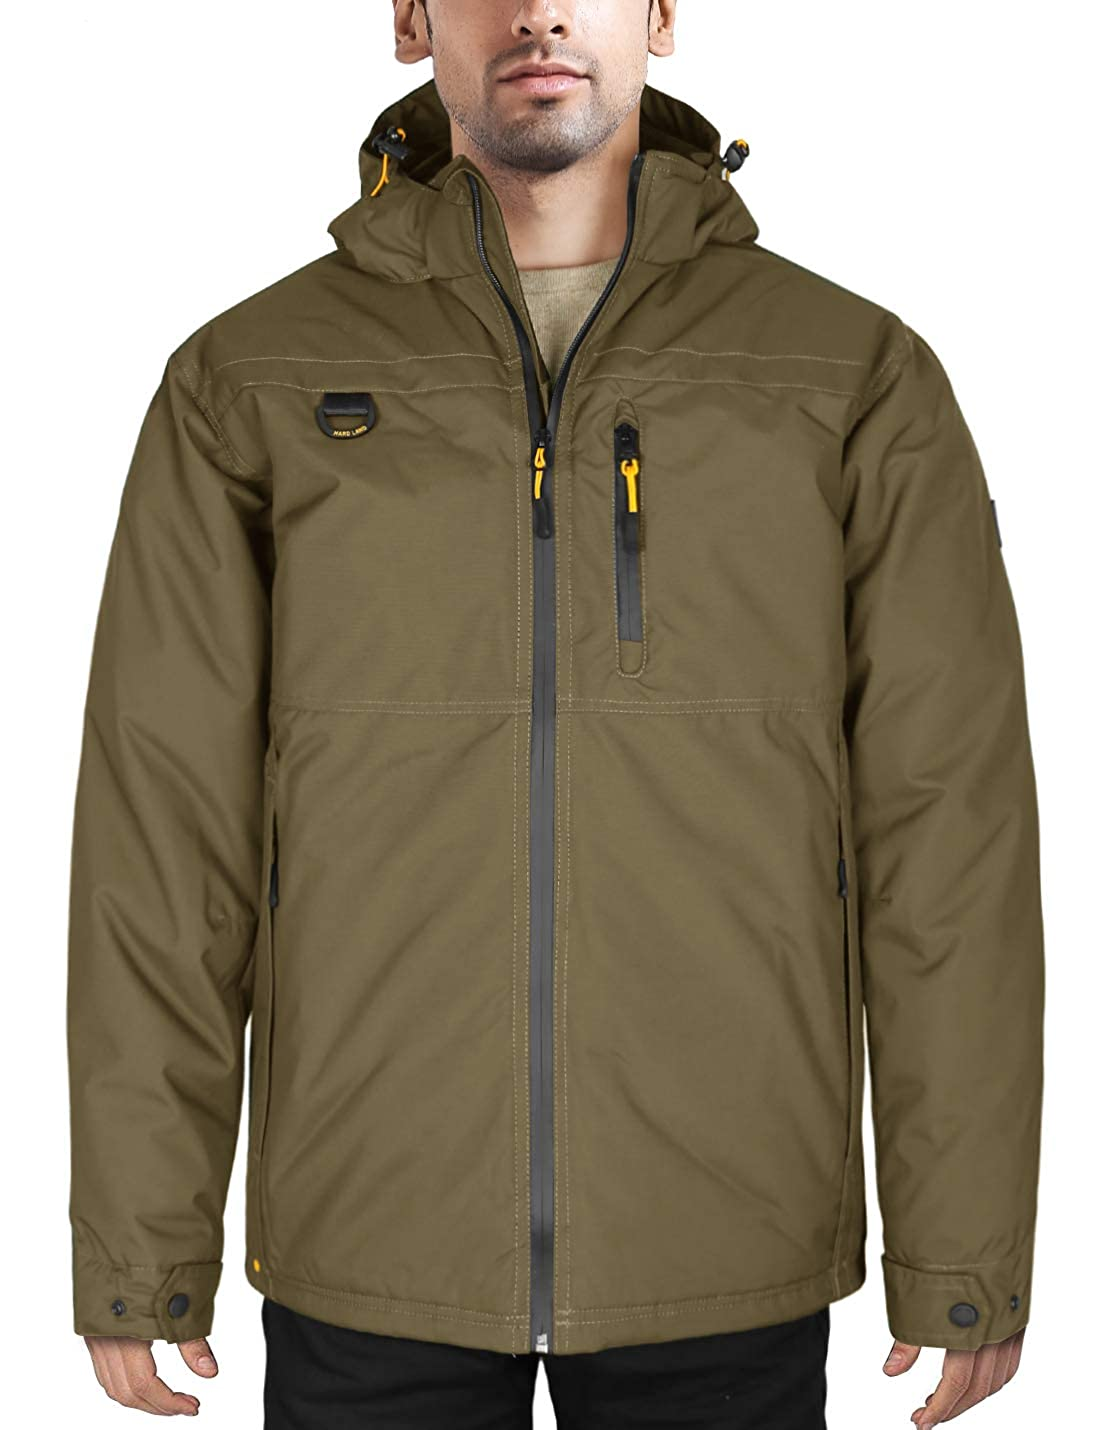 HARD LAND Men' s Waterproof Down Parka Jacket Winter Coats Warm Work Jacket with Removable Hood Ski Jacket, Fill Power 650